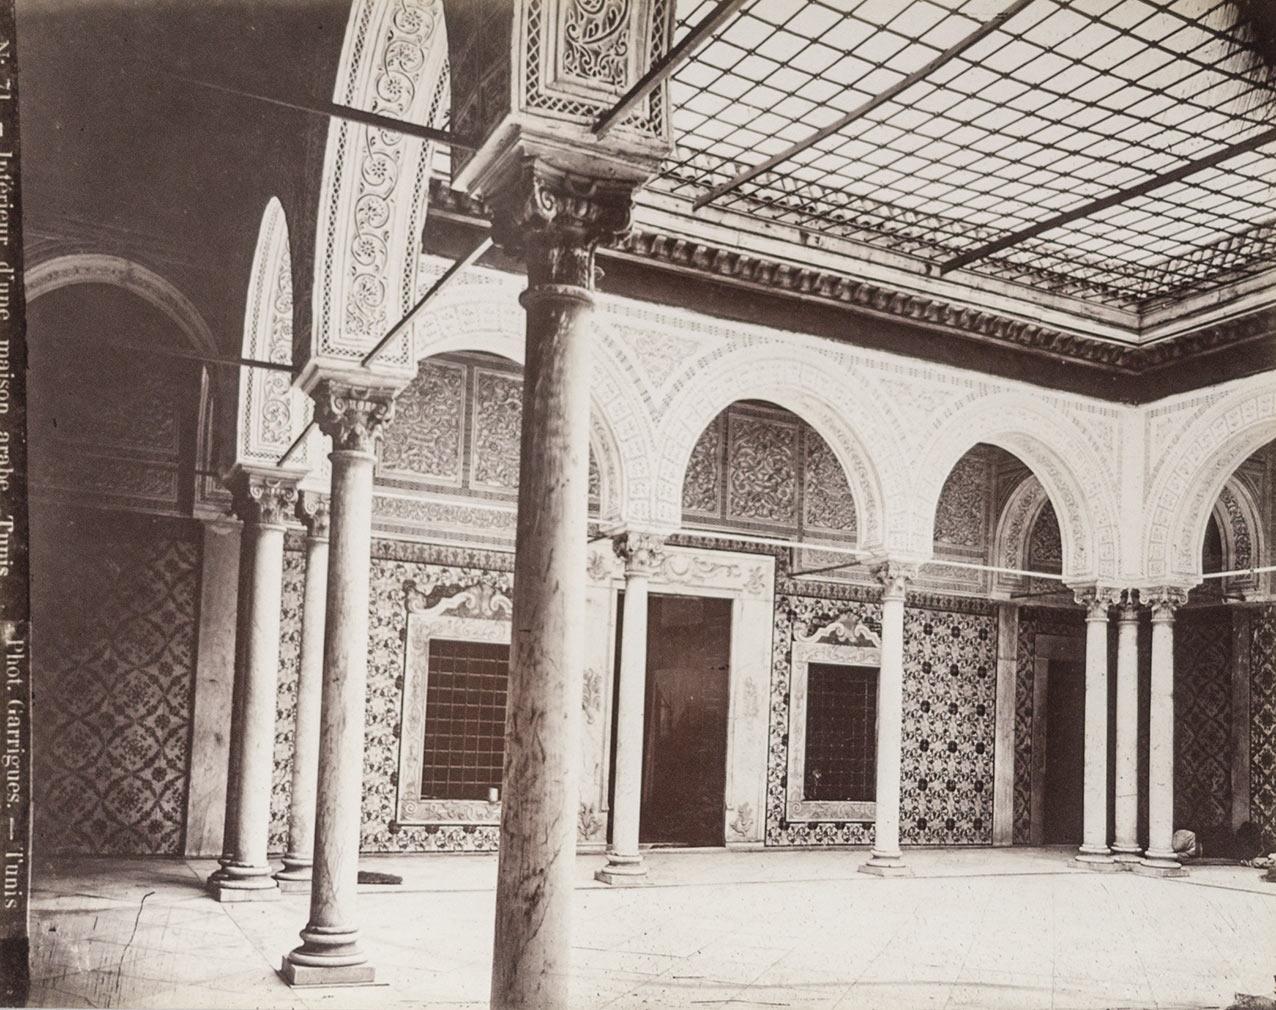 Tunis. Interieur d une maison arabe, Tunis. Original-Fotografie ...